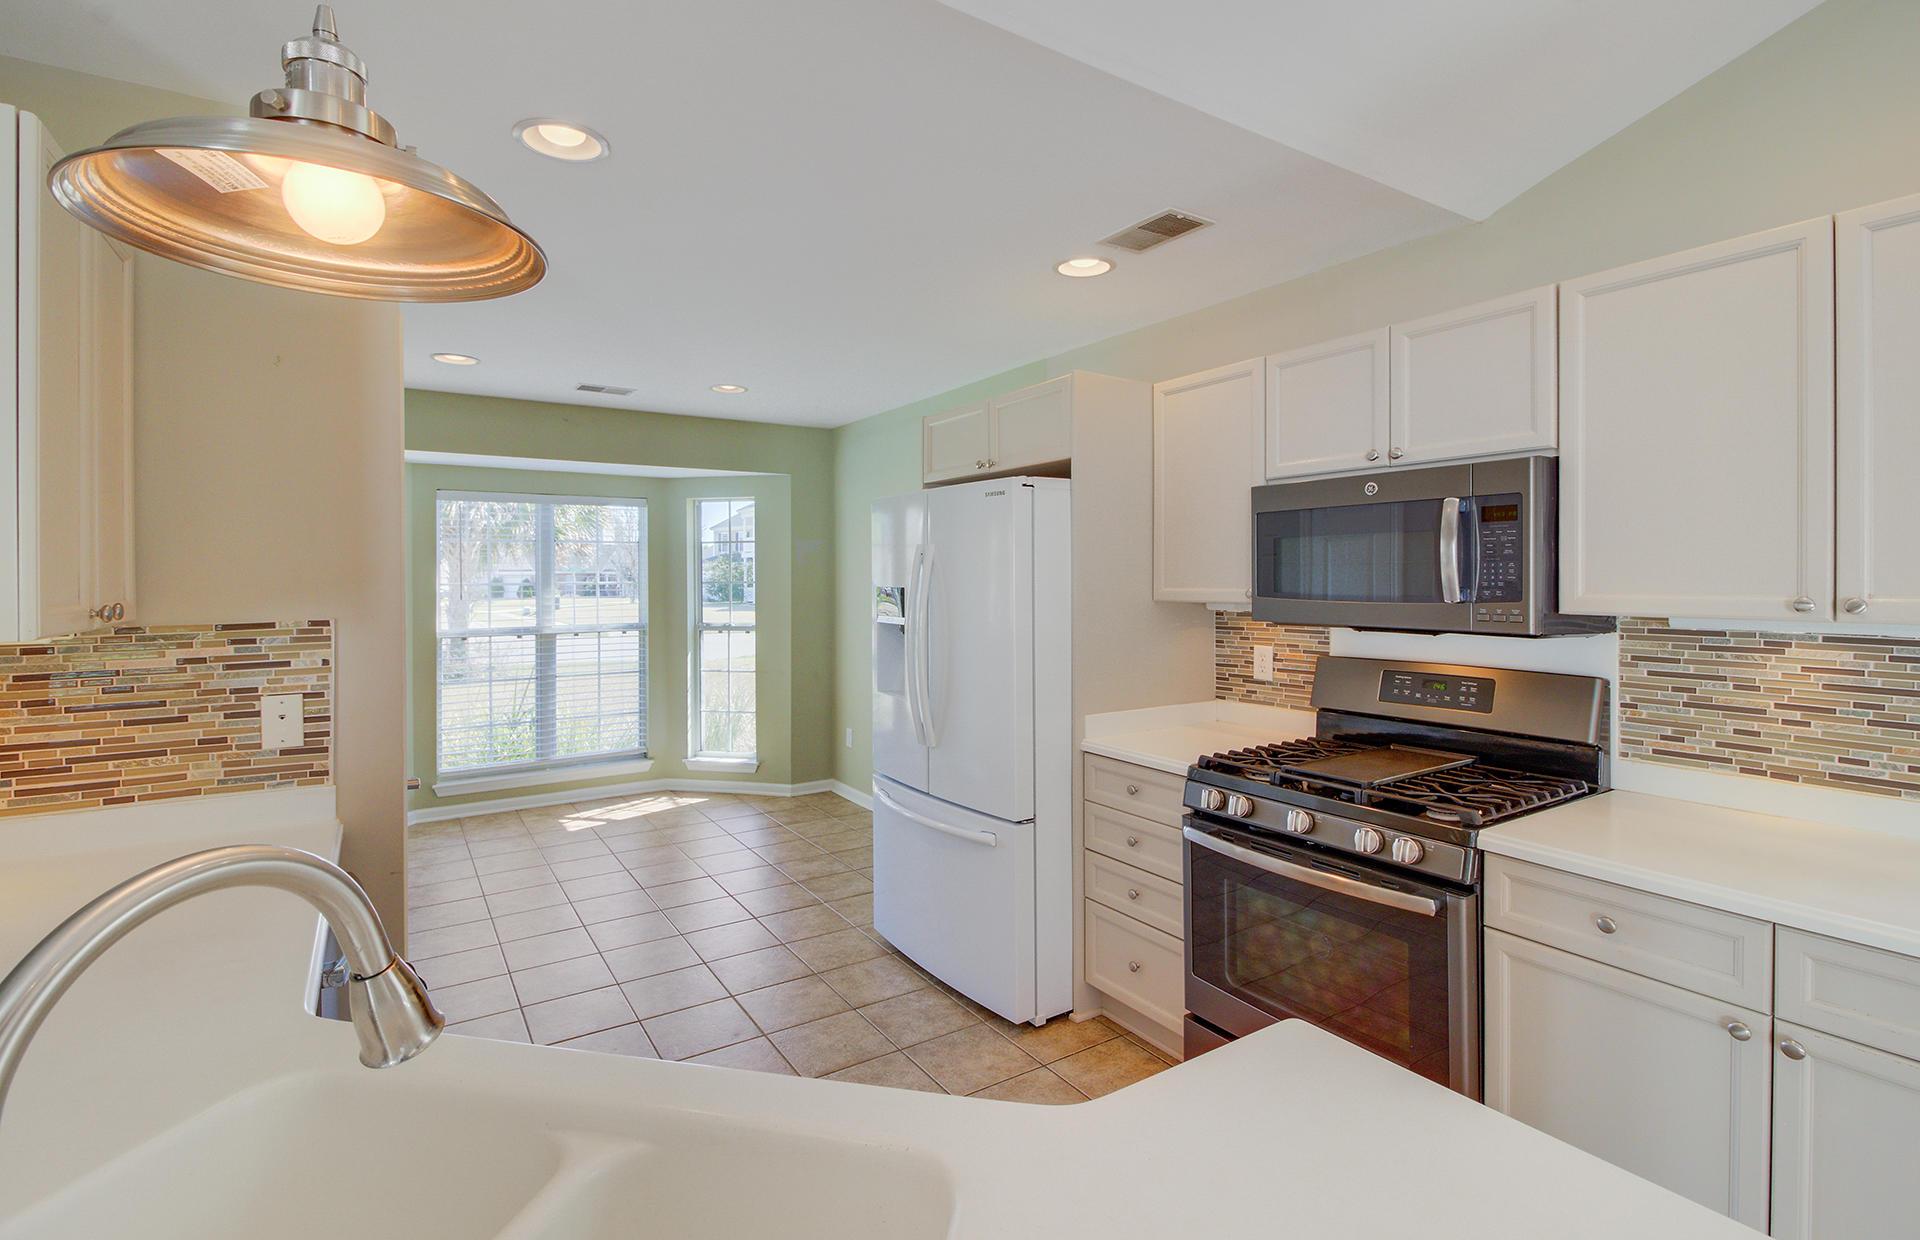 Grand Oaks Plantation Homes For Sale - 789 Bent Hickory, Charleston, SC - 11